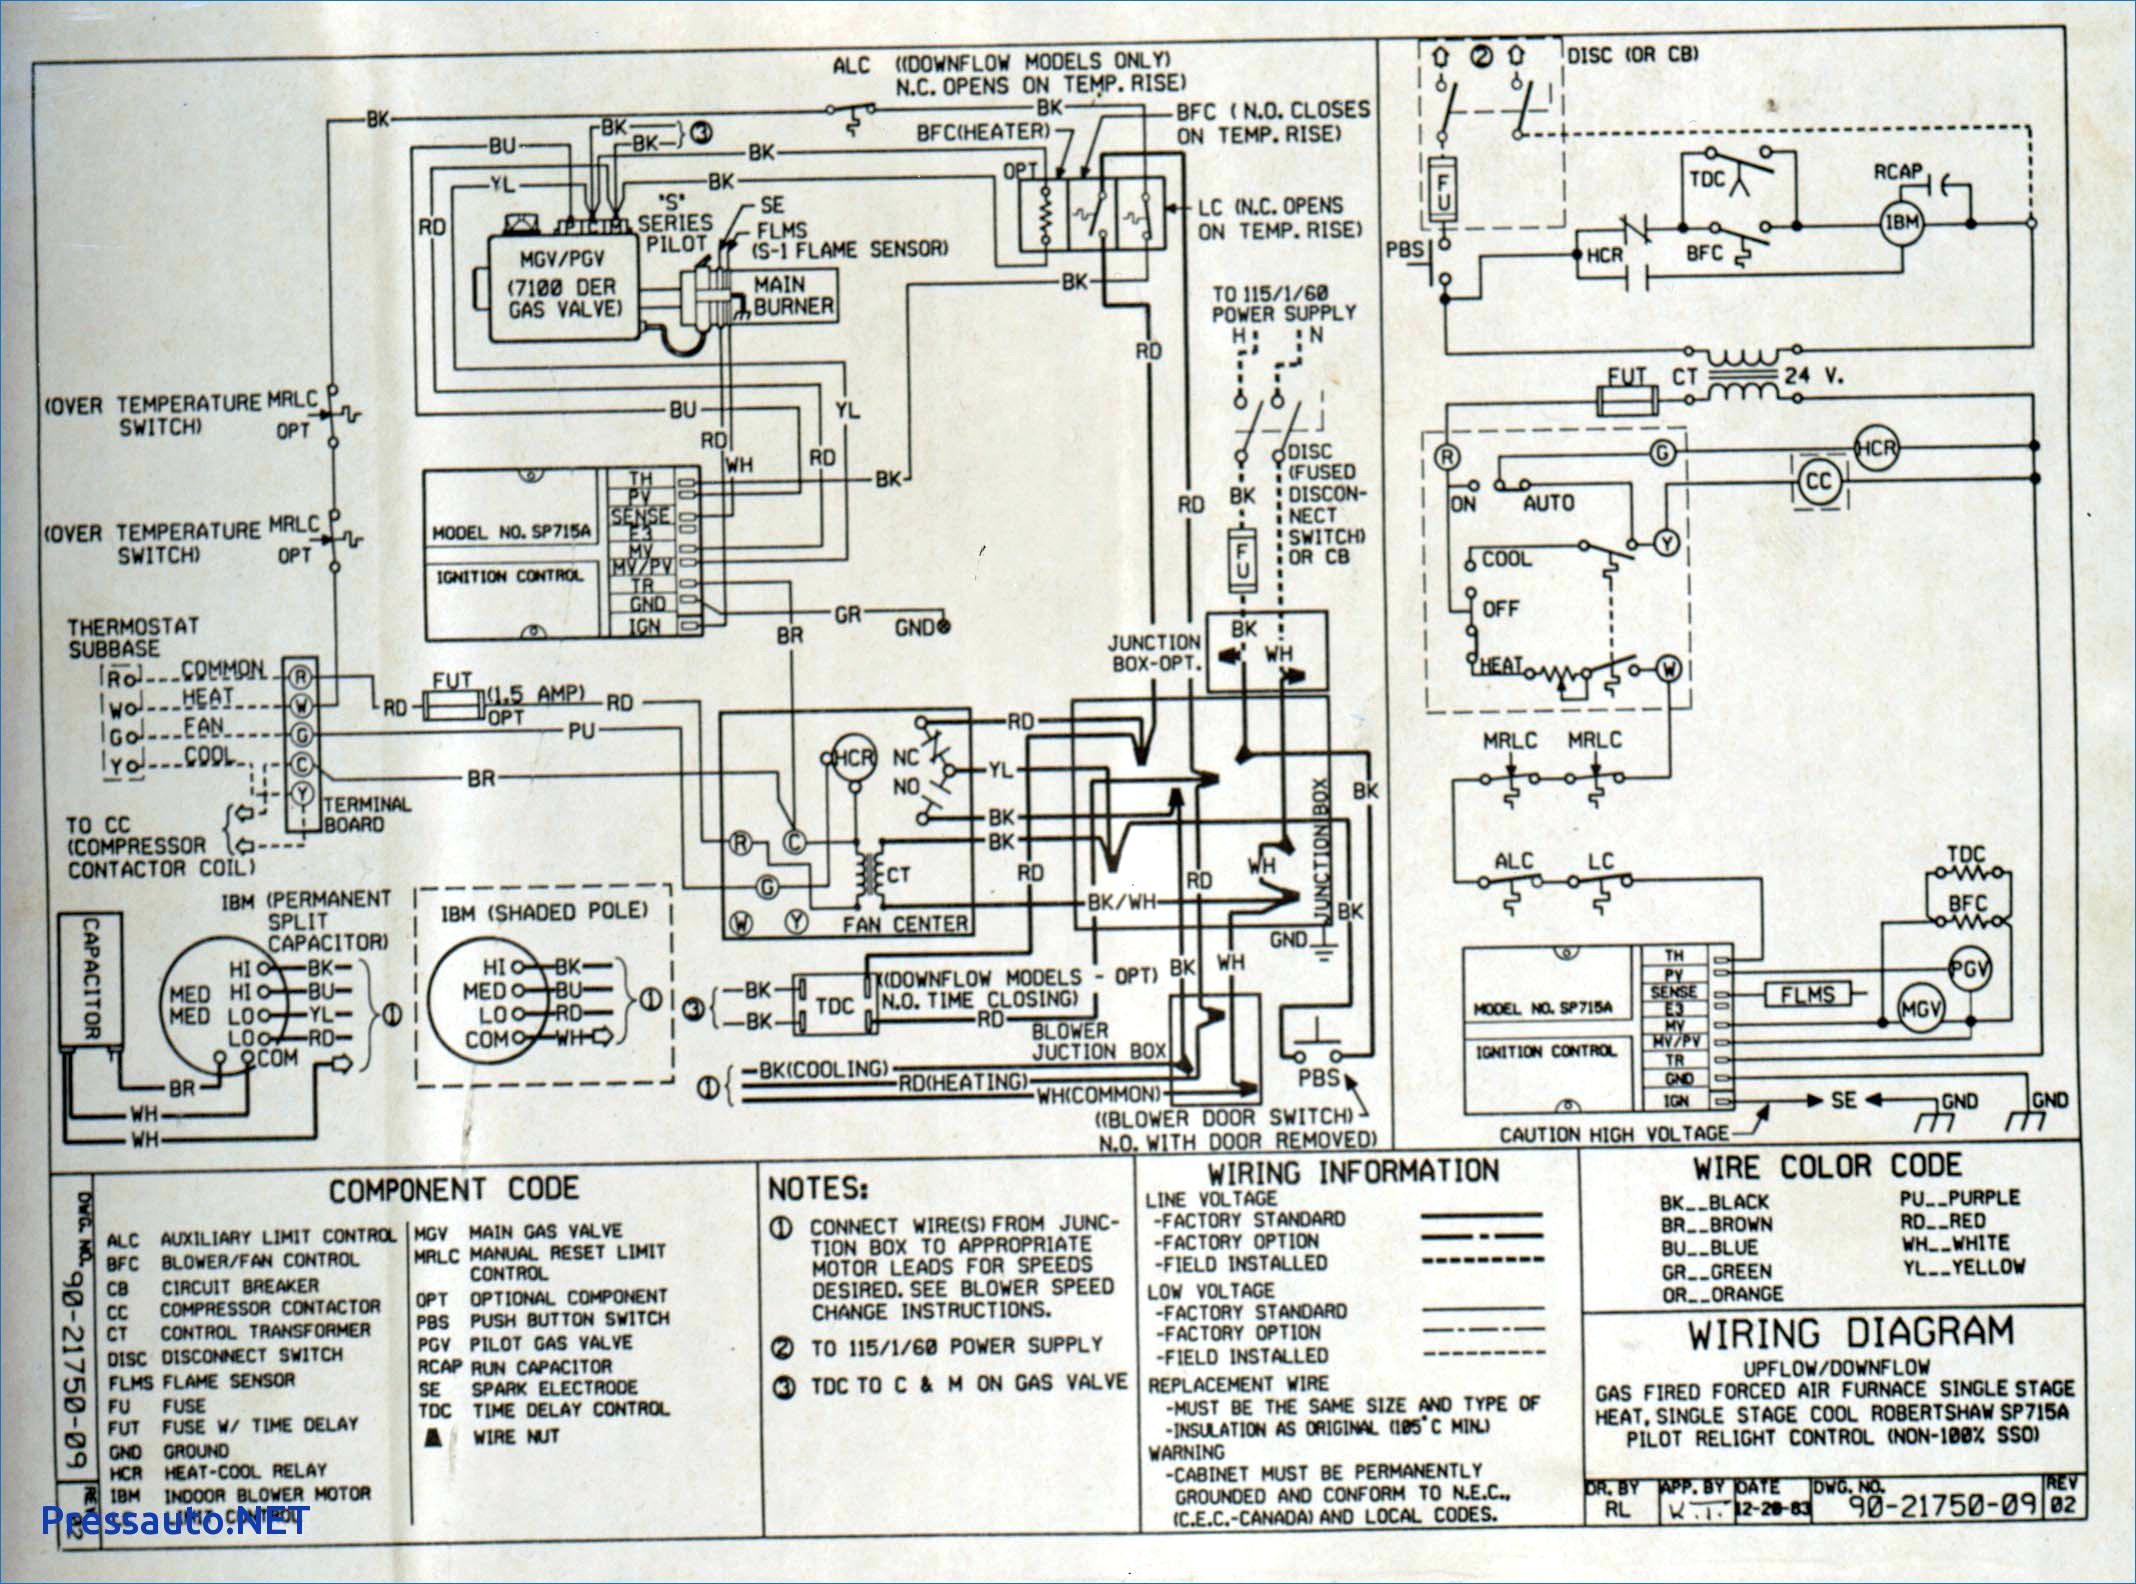 American Standard Furnace Wiring Diagram American Standard Furnace Wiring Diagram Diagrams Heat Pump Ac Unit Of American Standard Furnace Wiring Diagram